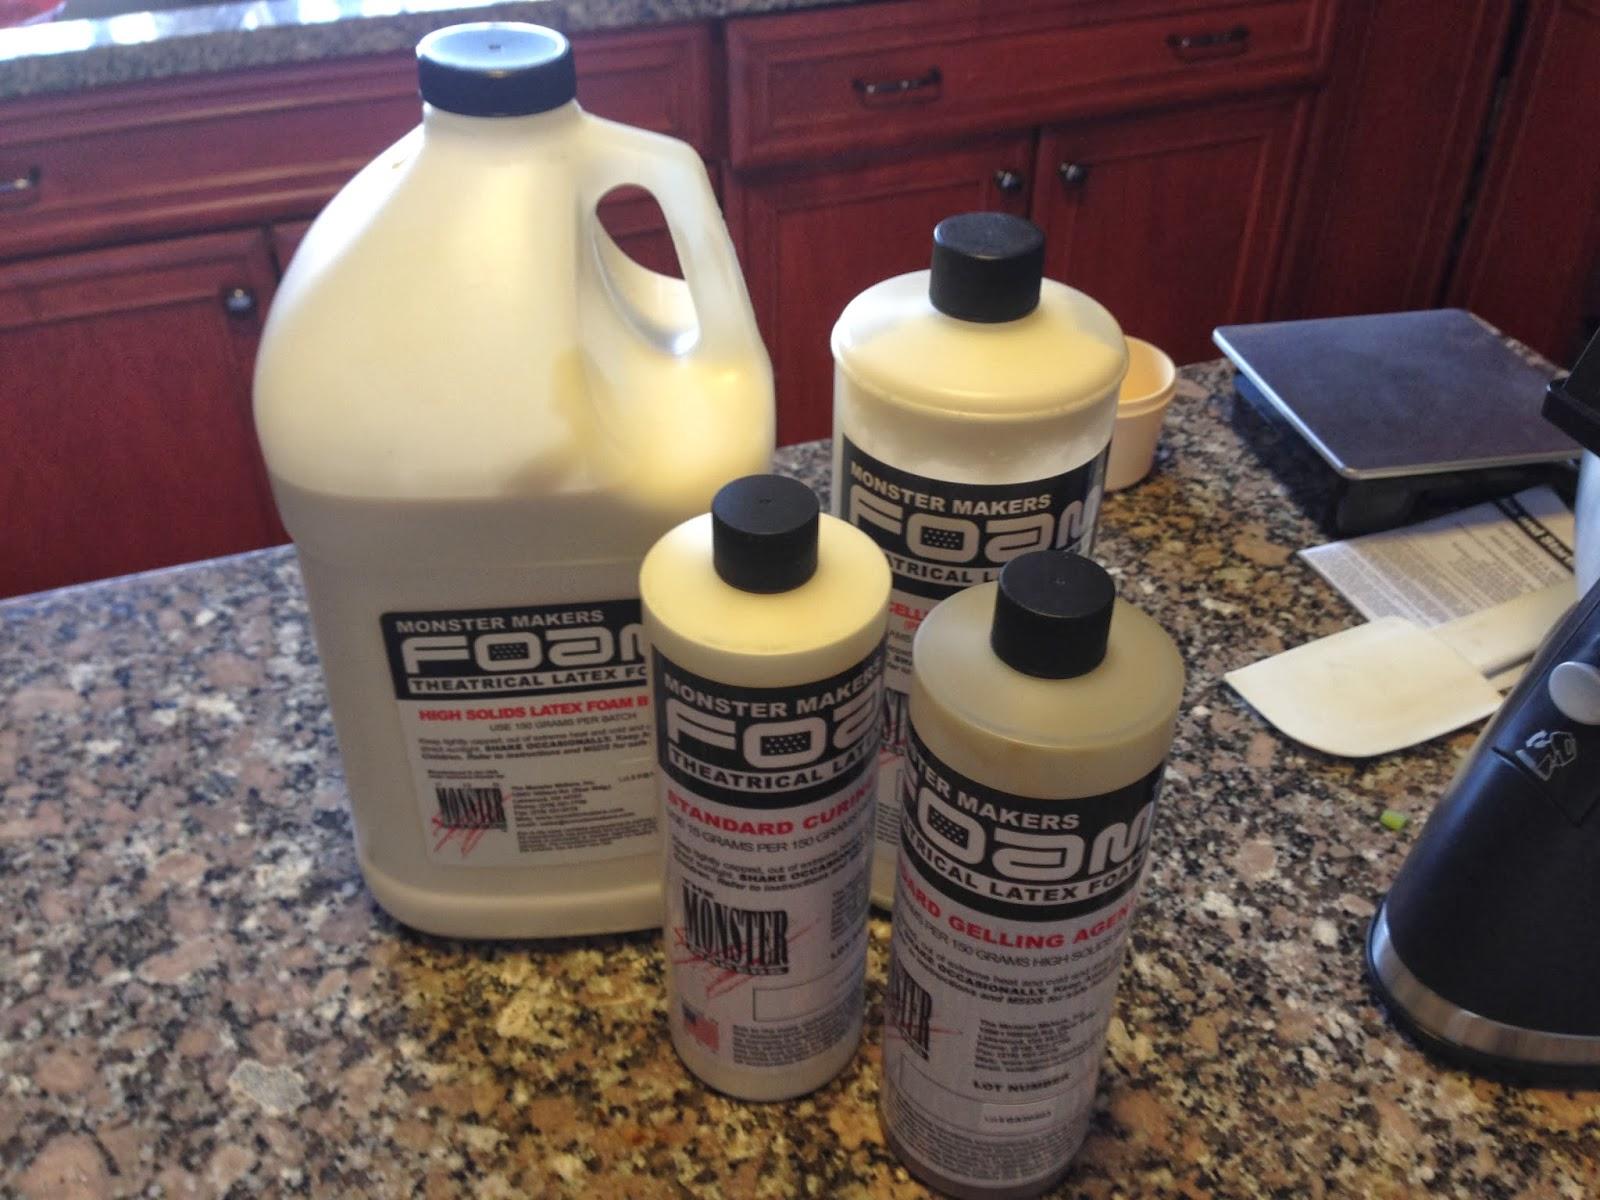 GM Foam, hot foam latex kits